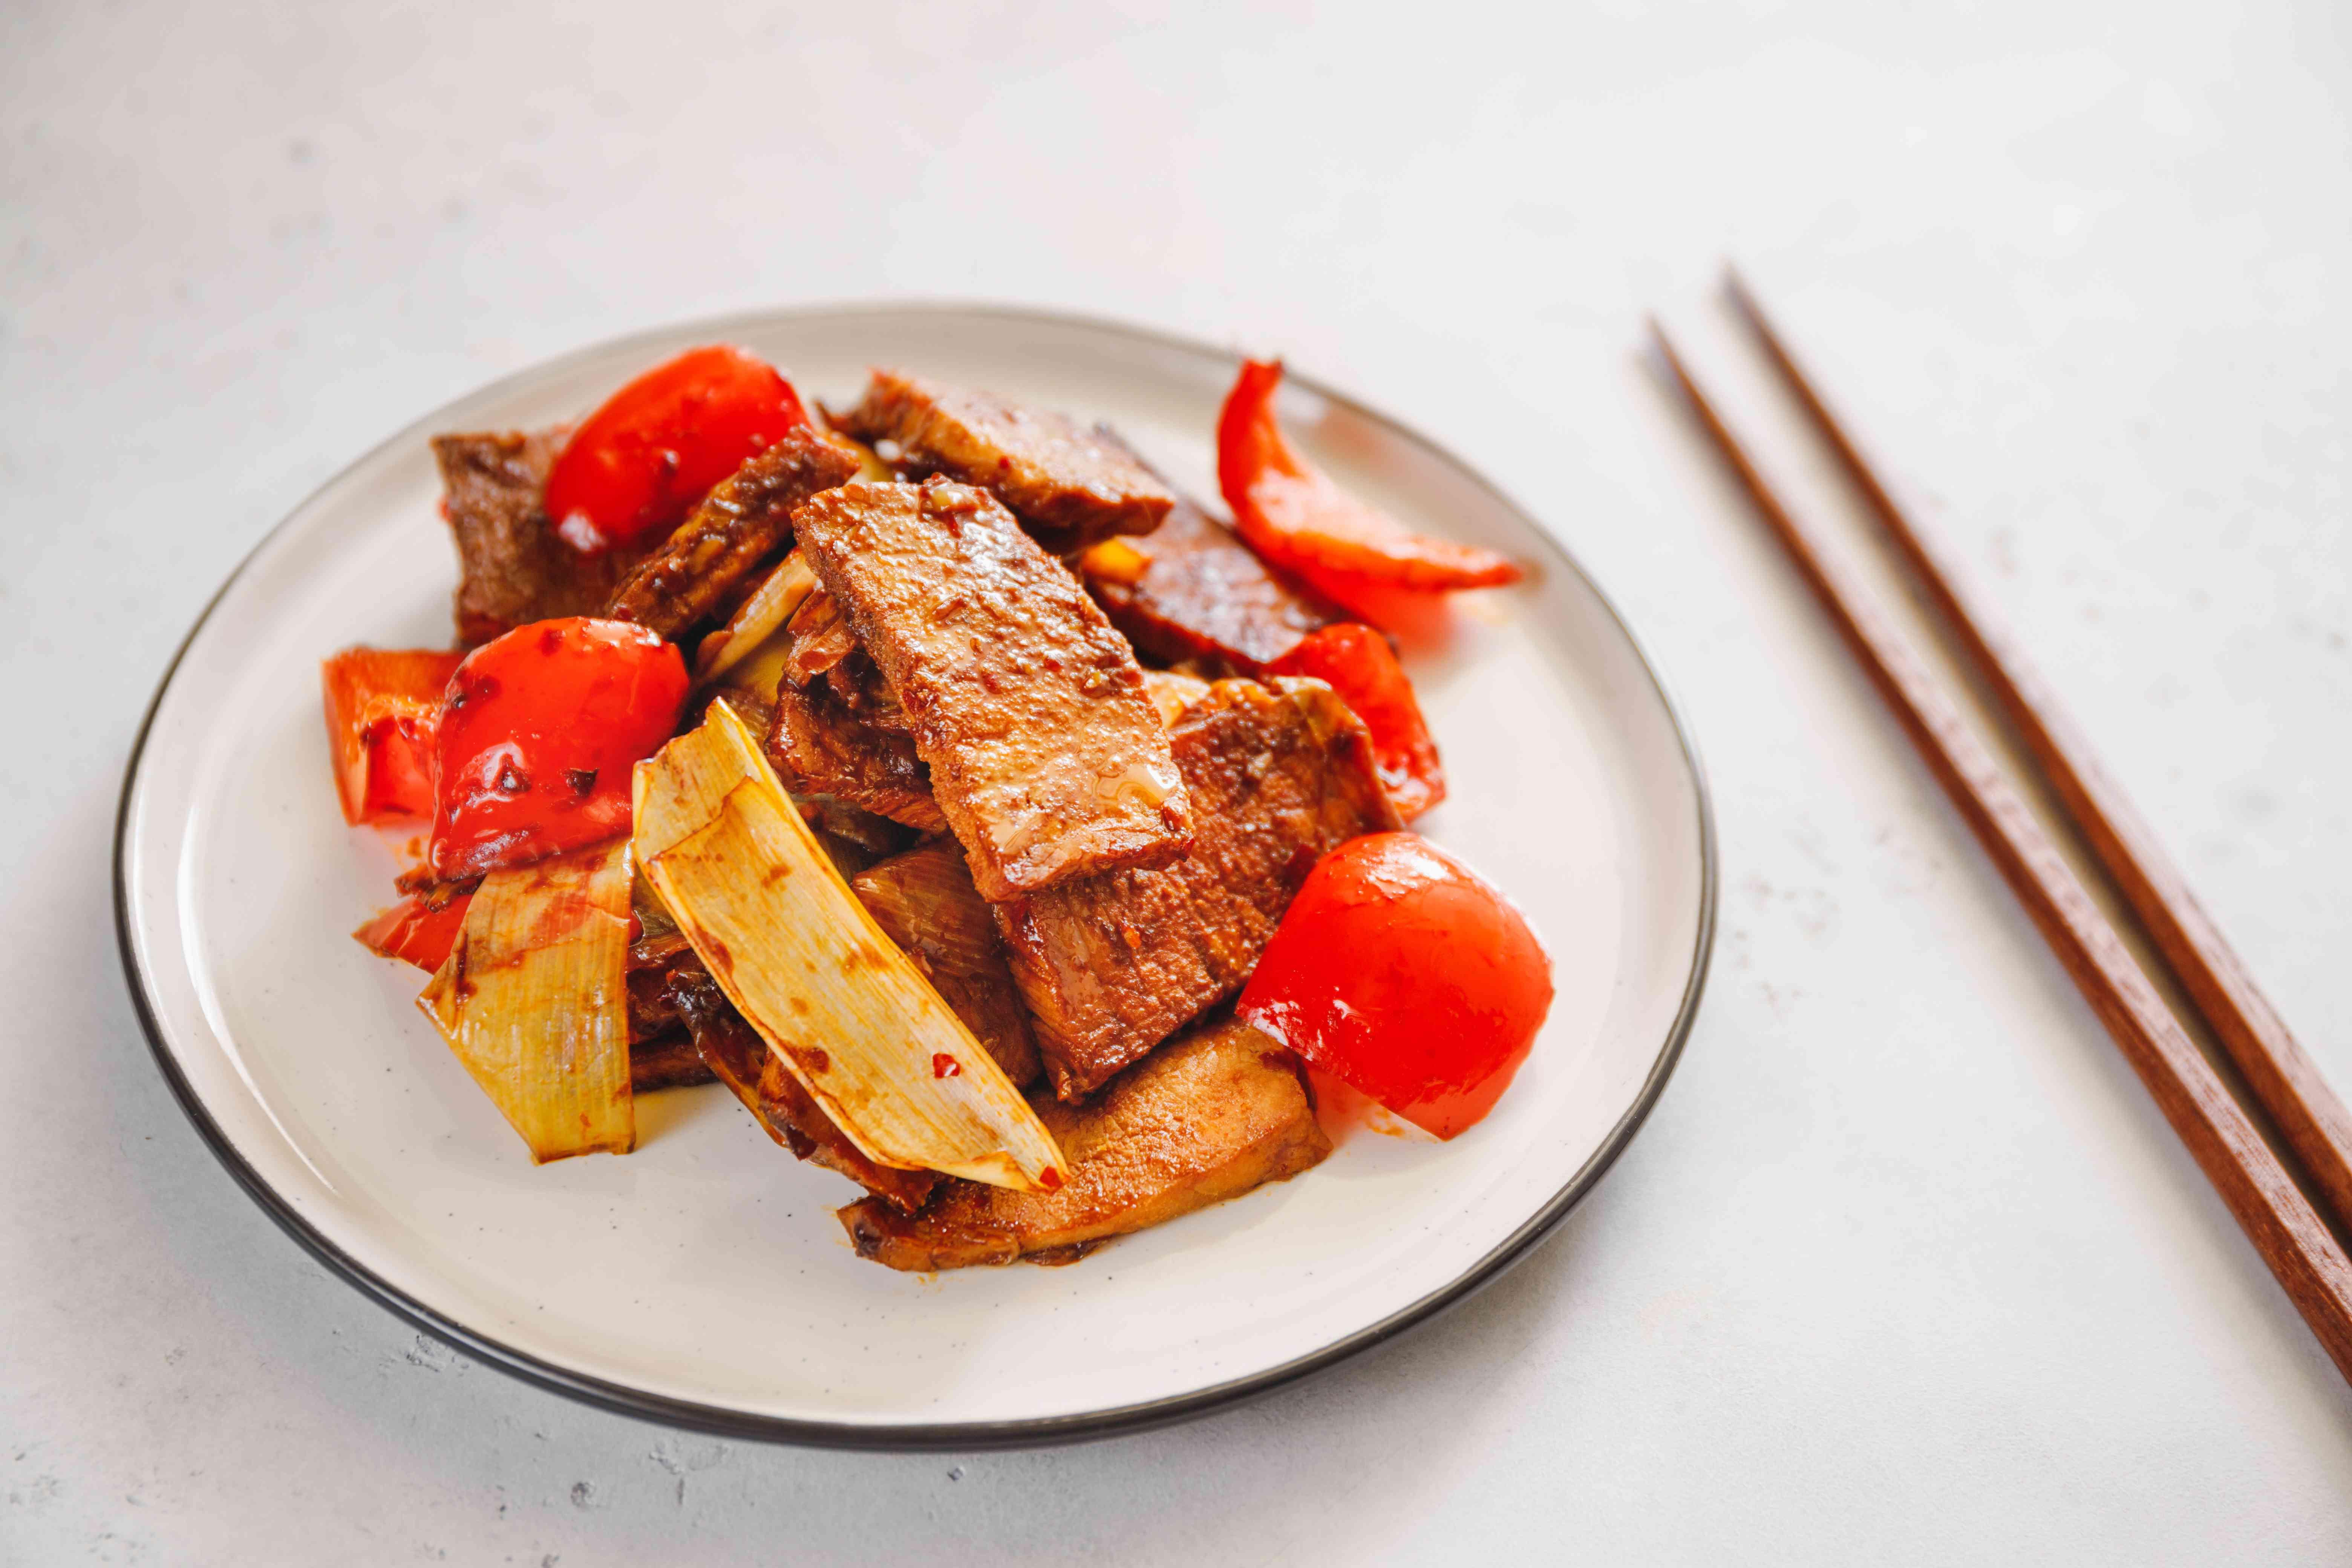 Twice cooked pork hui guo rou recipe